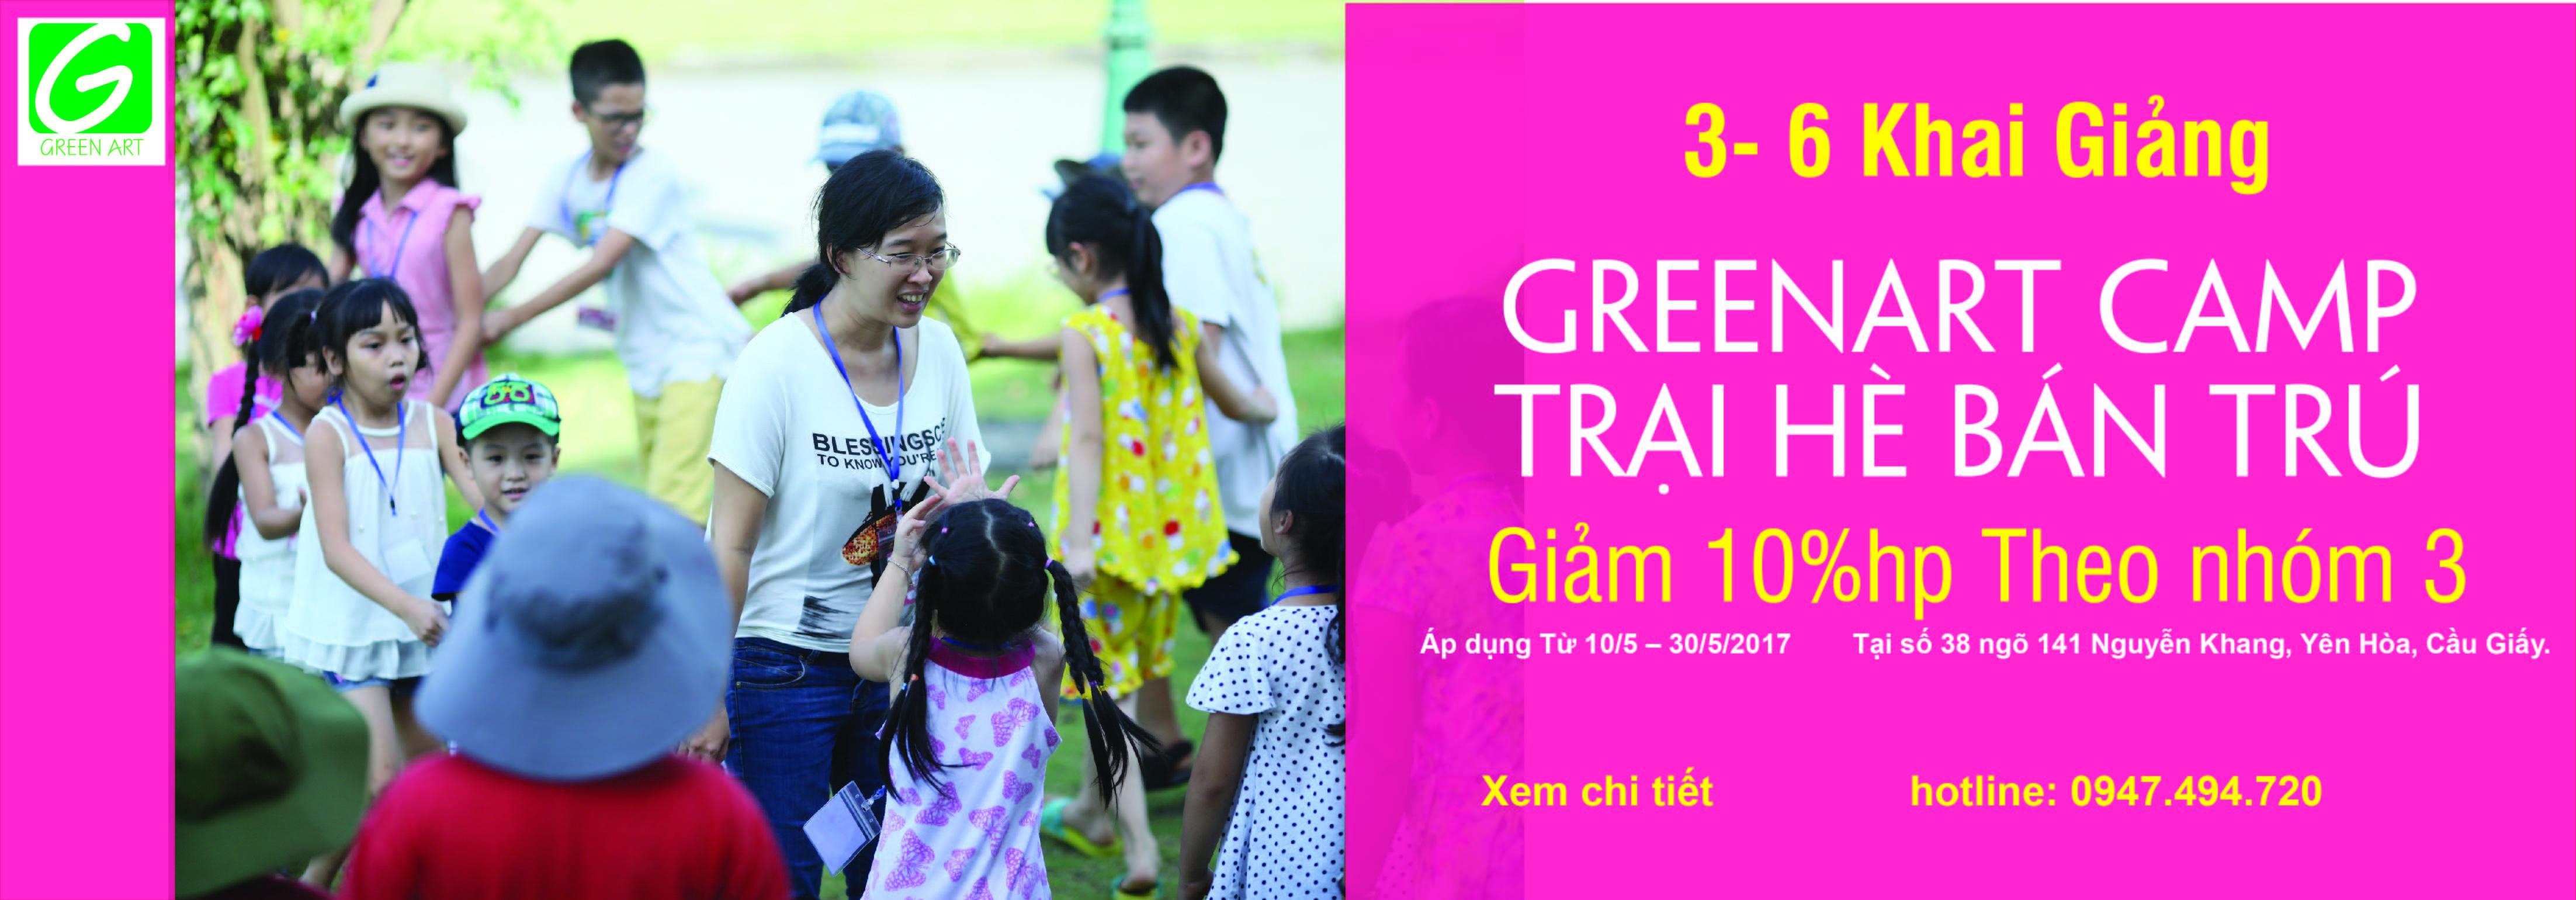 GREEN ART CAMP – Trại hè bán trú